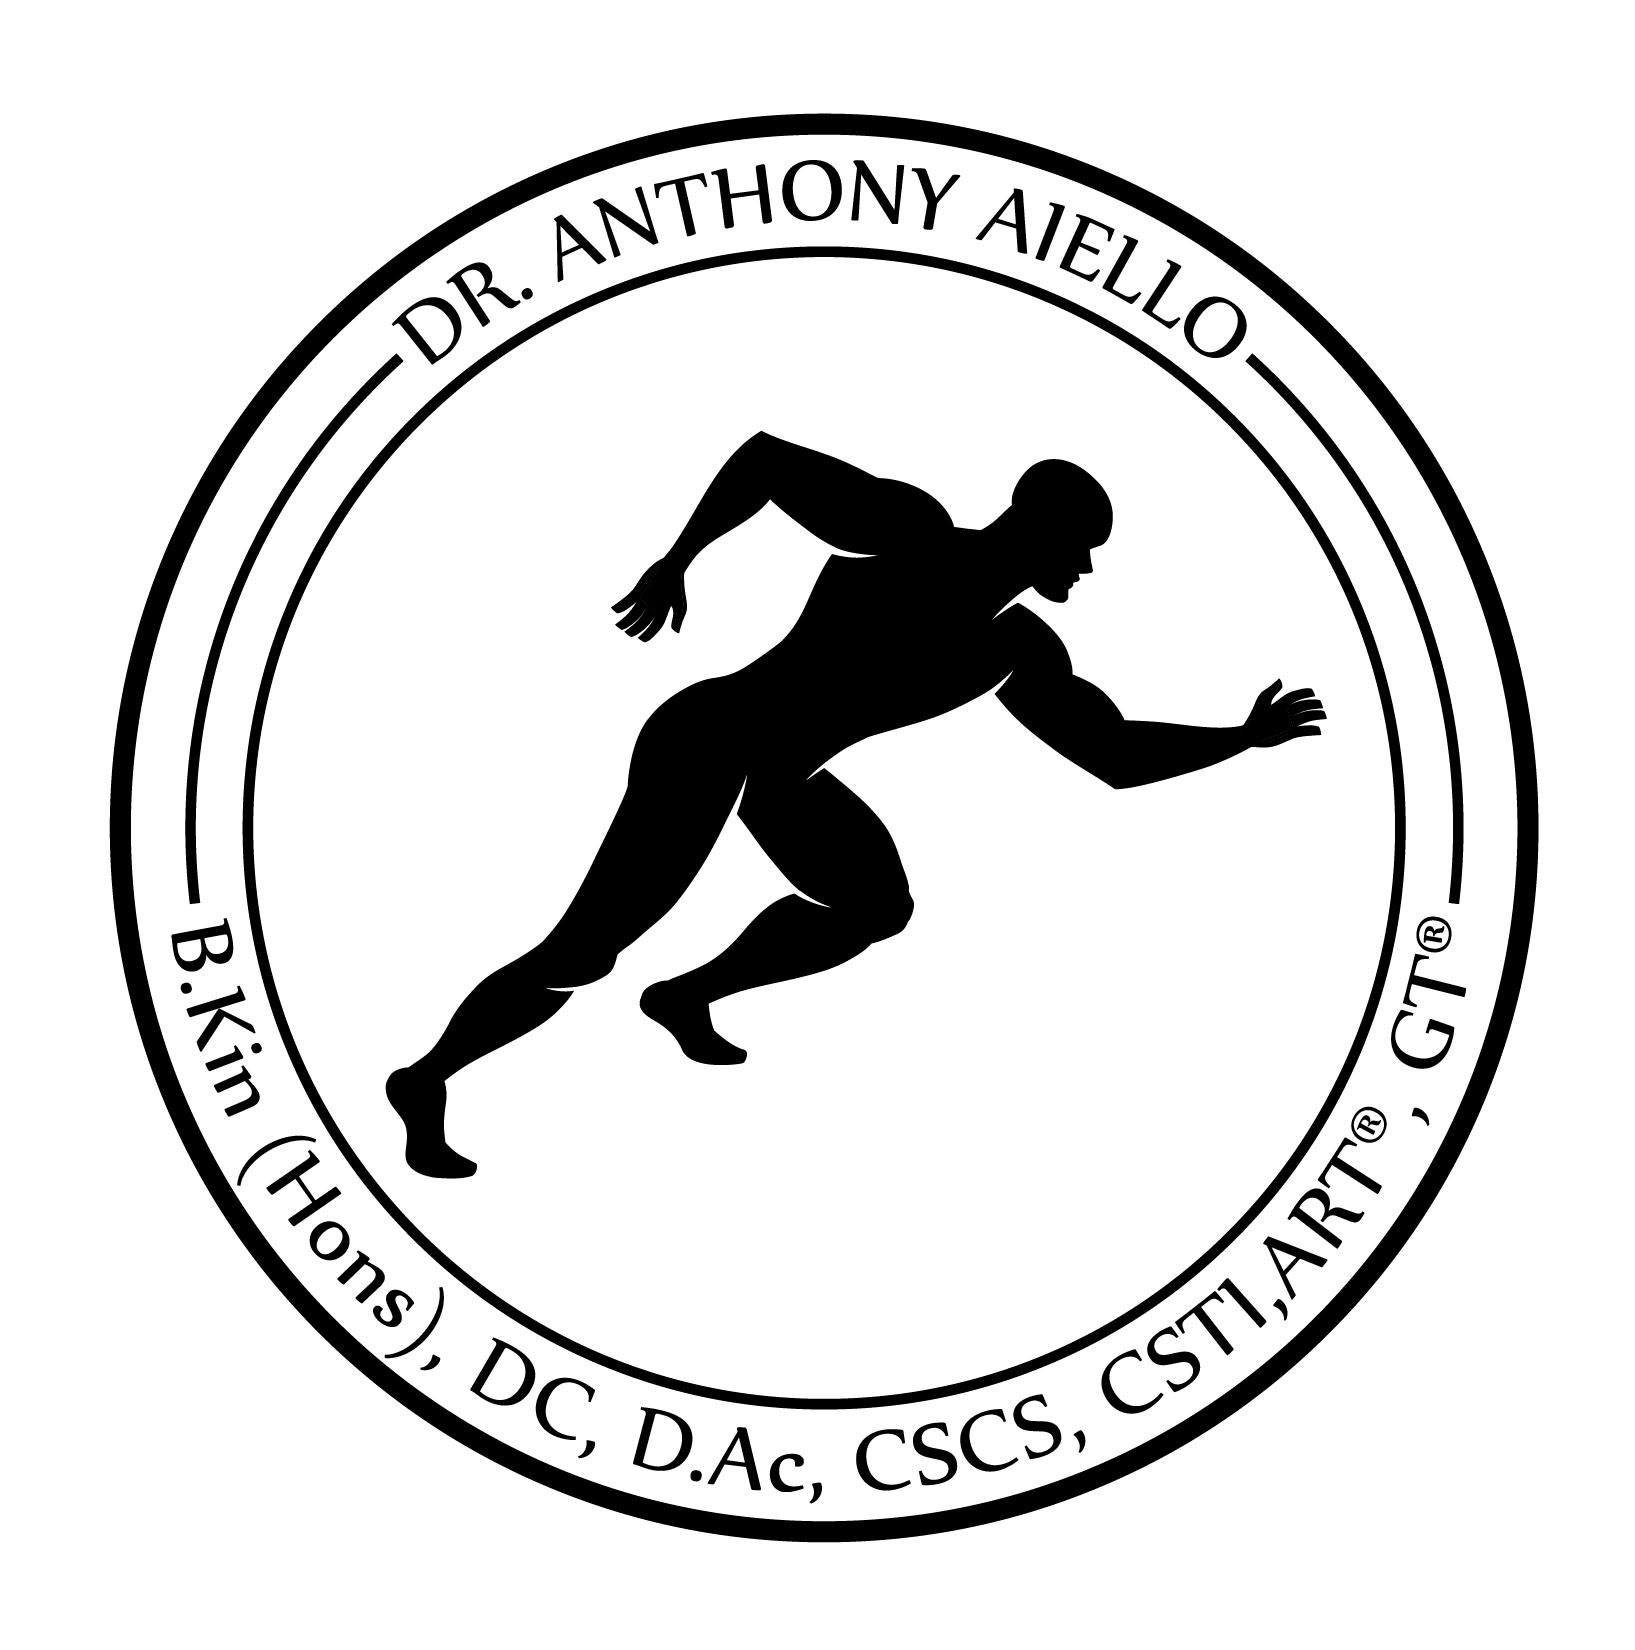 Anthony Aiello